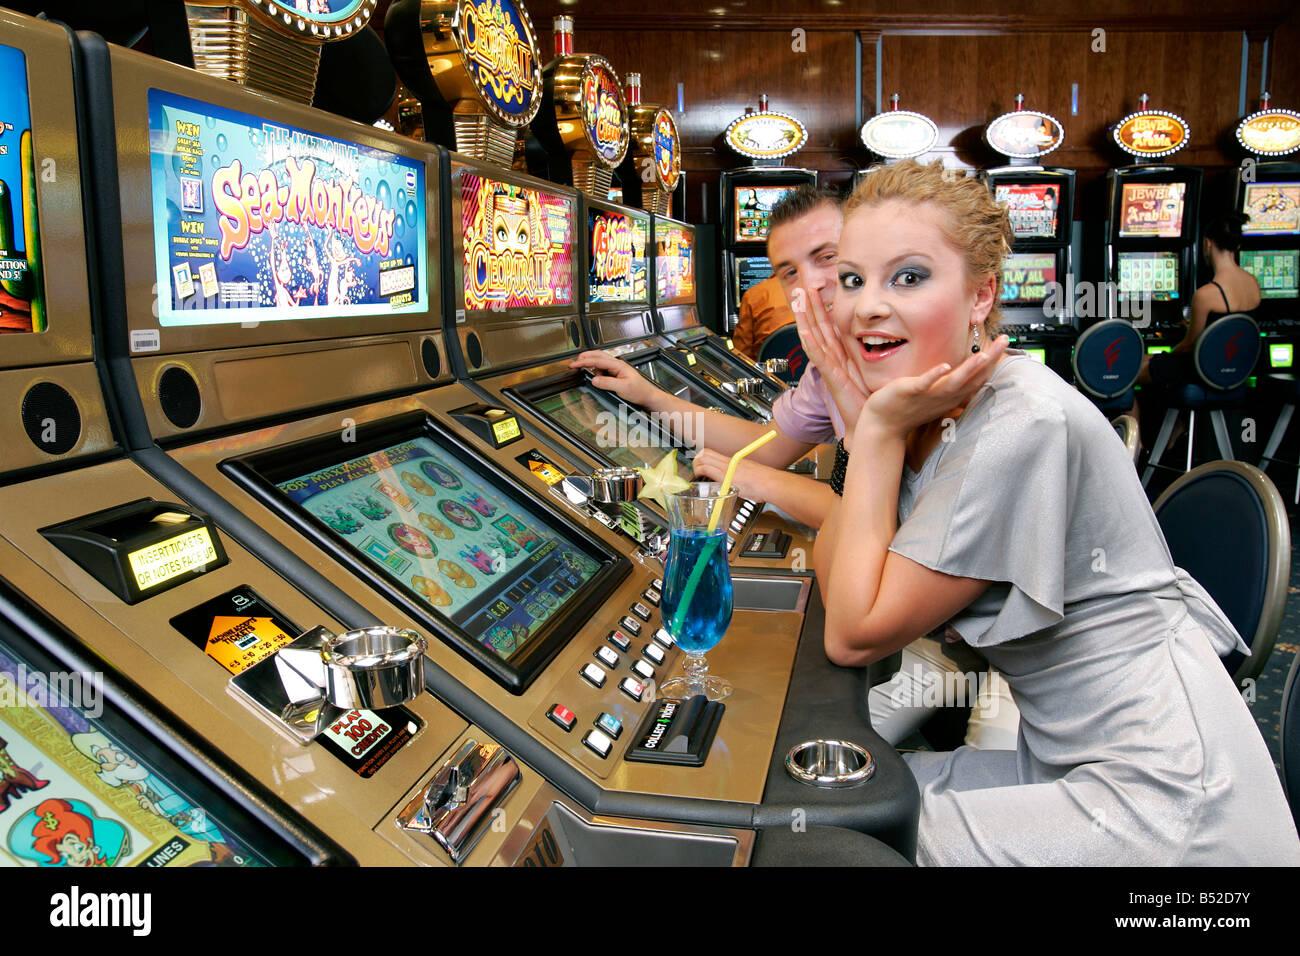 1 Slot Machines With Women